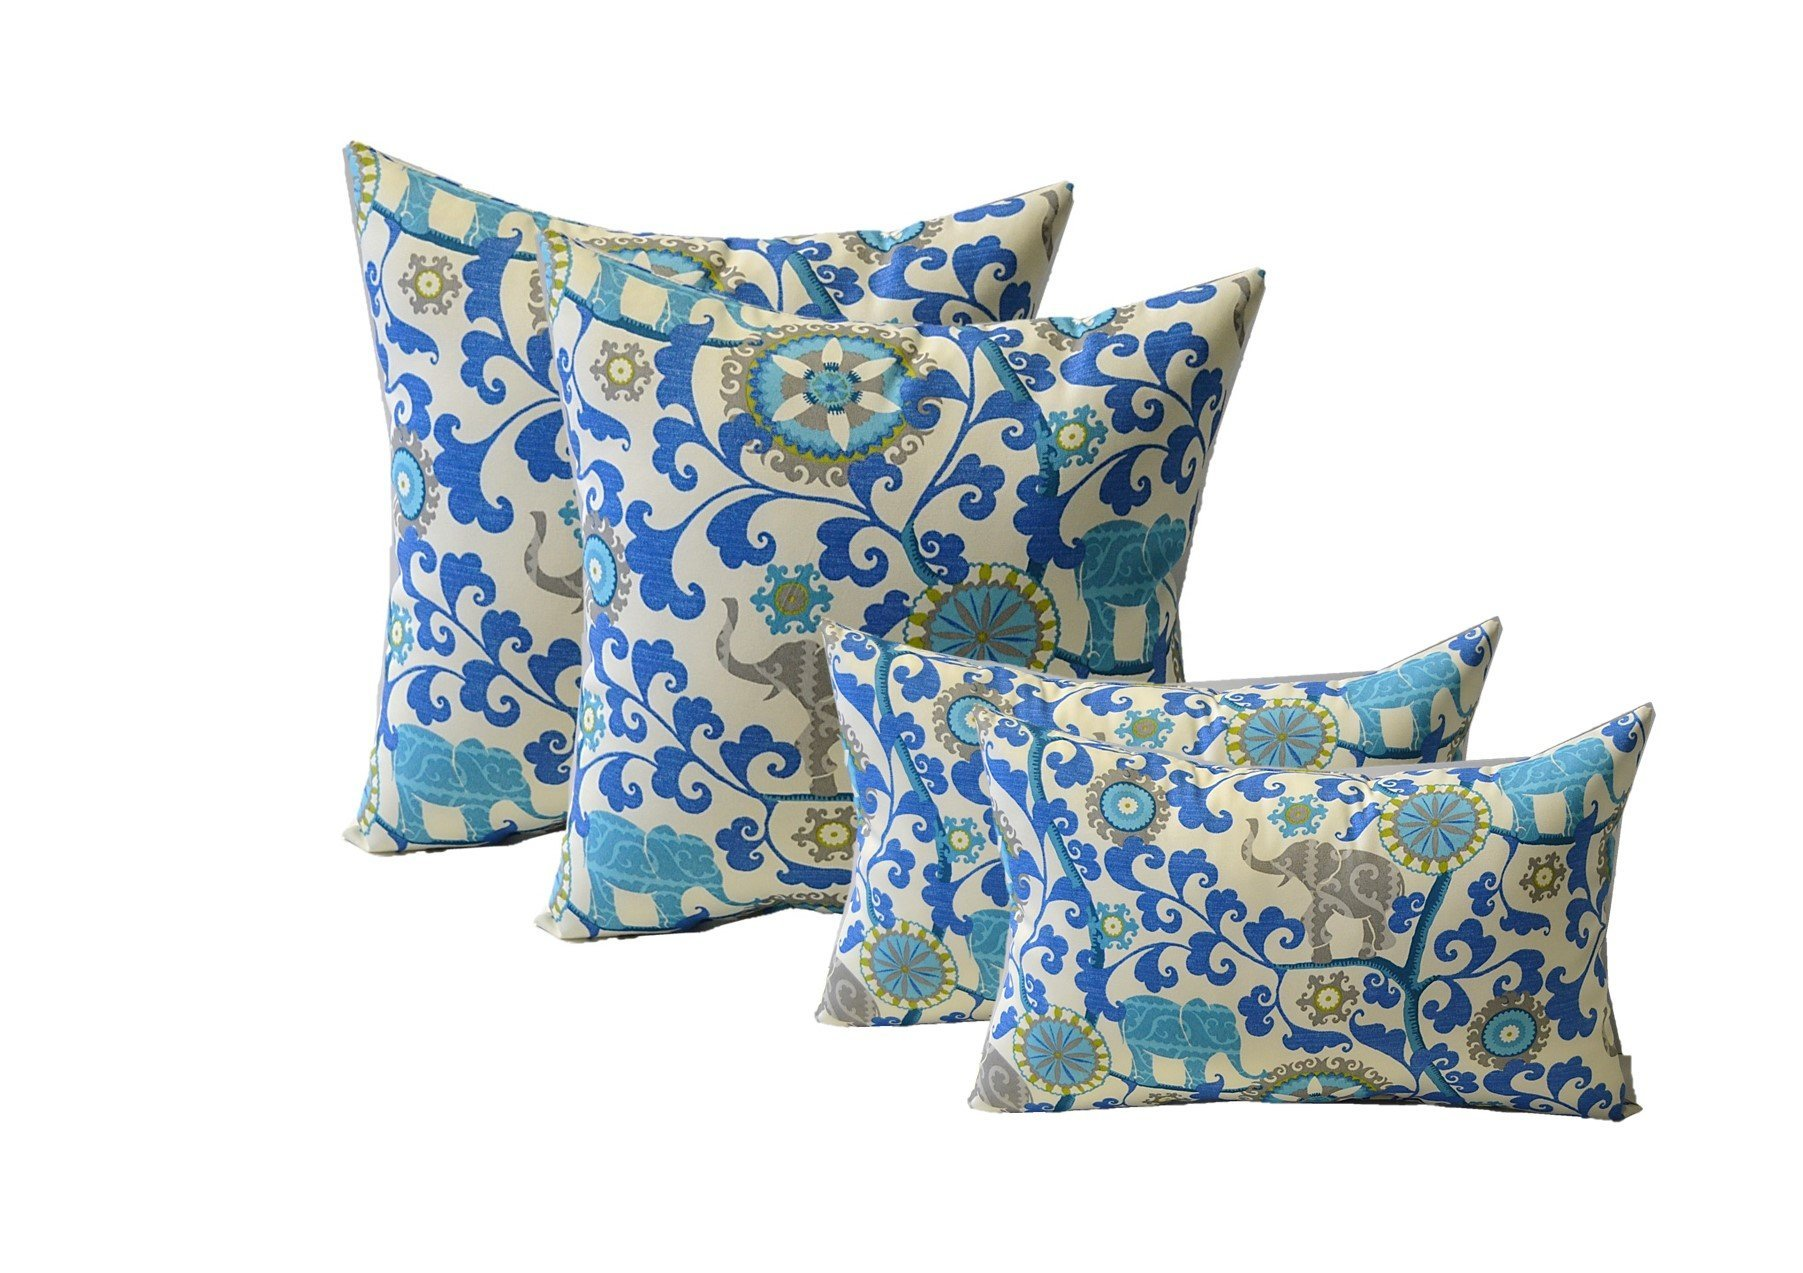 Green Sapphire Blue Gray Bohemian Elephant Decorative Indoor  Outdoor Rectangle  Lumbar Pillows Turquoise Set of 2